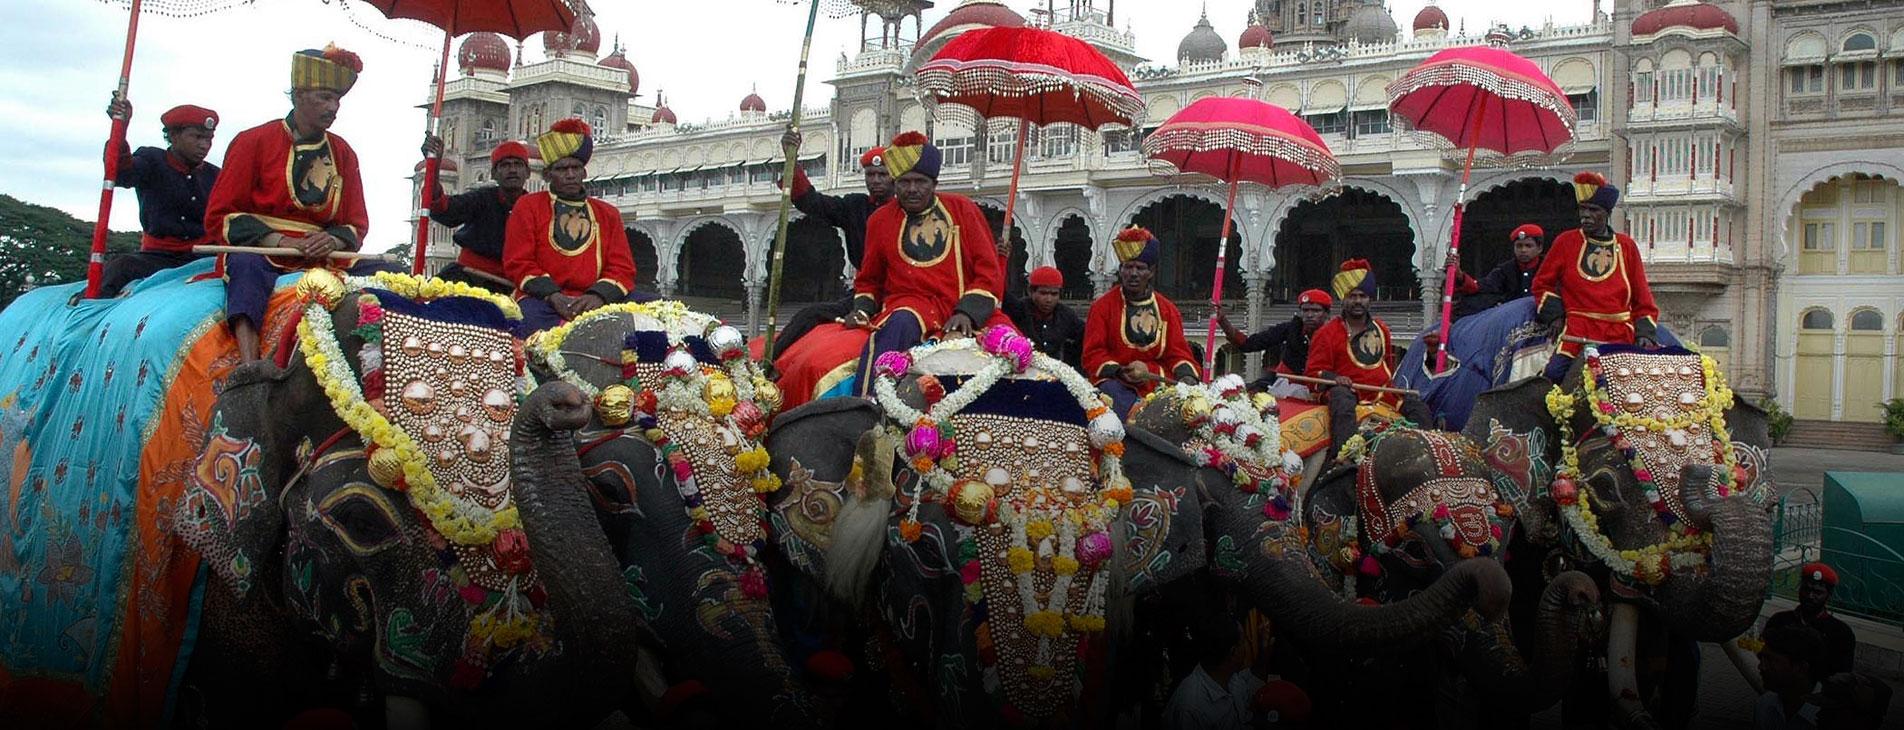 famous cultural festivals